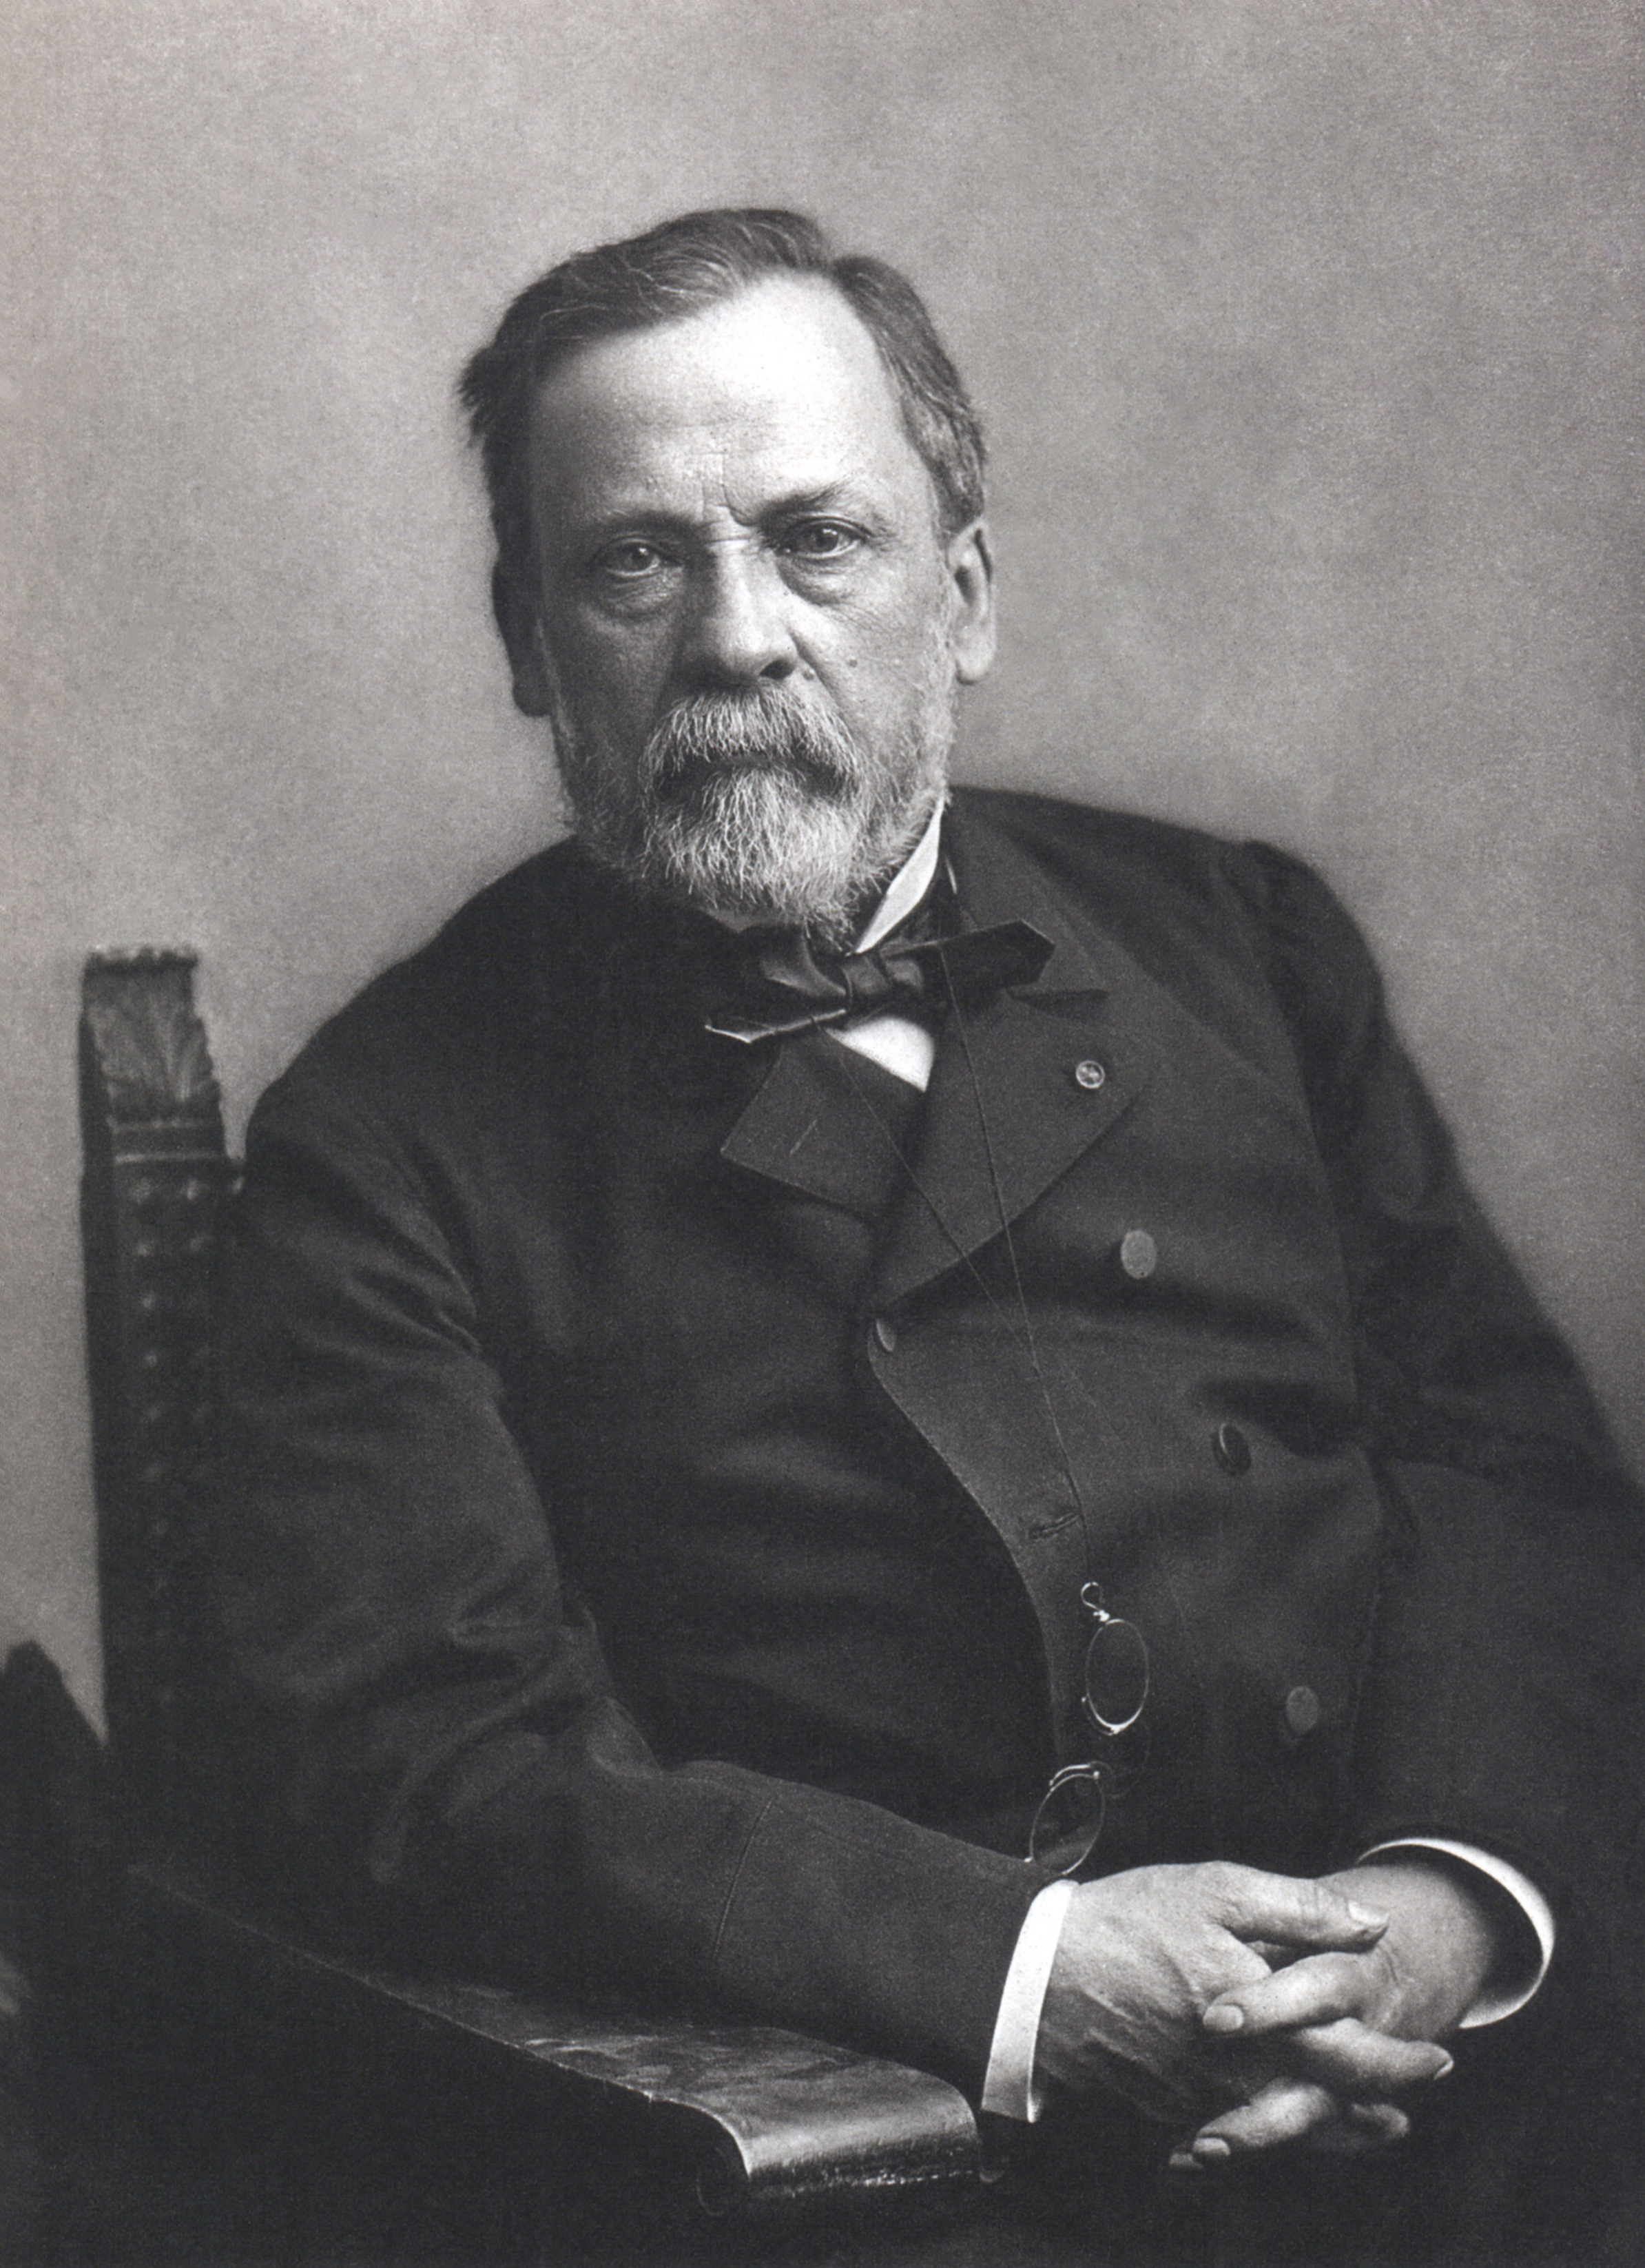 Louis_Pasteur,_foto_av_Paul_Nadar,_Crisc